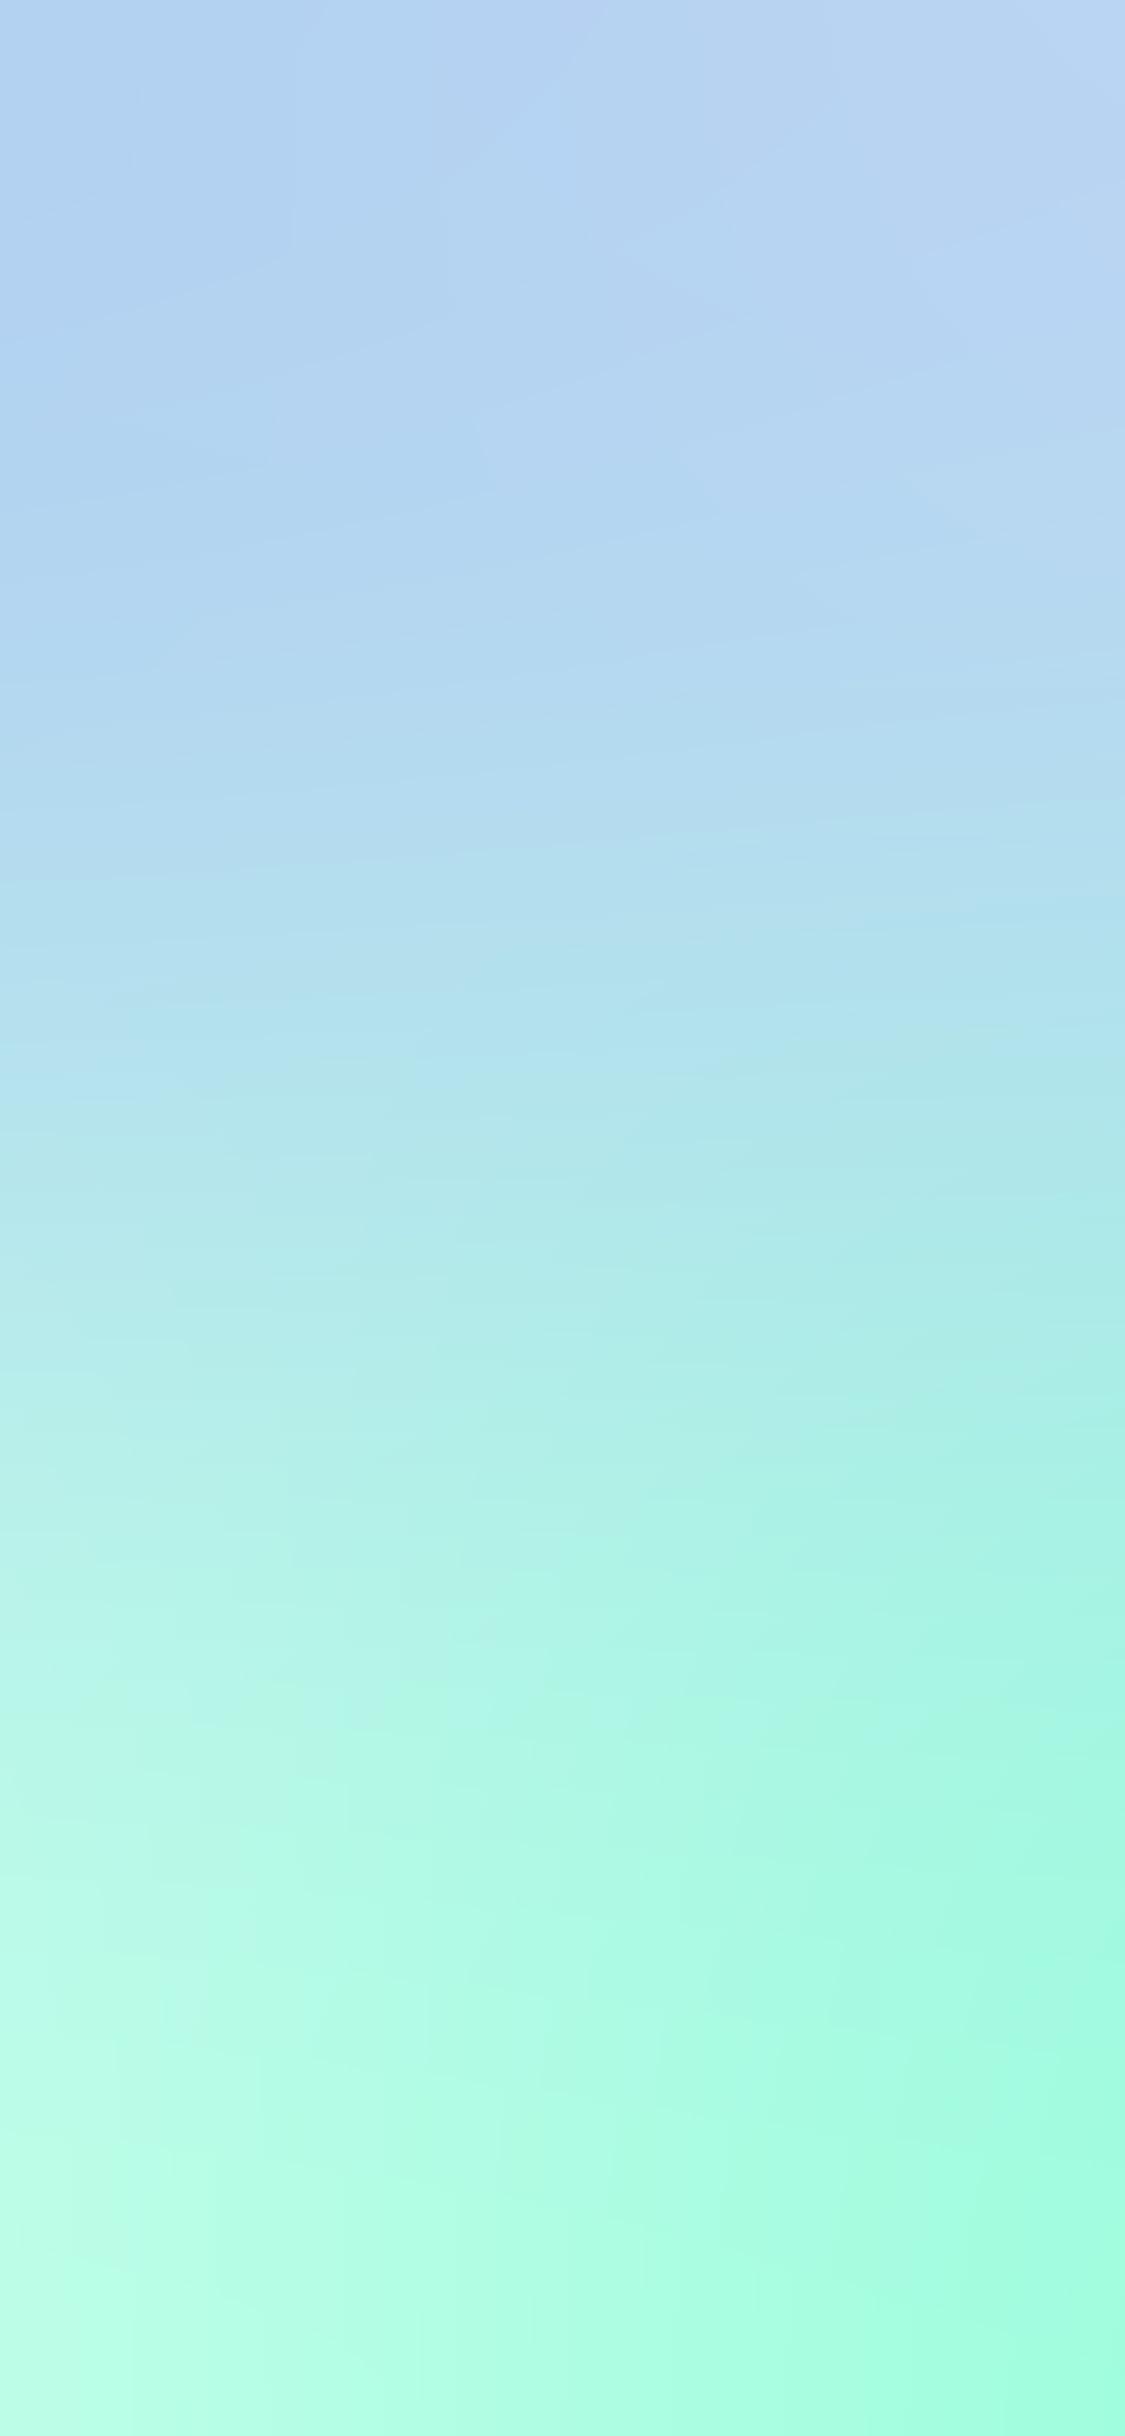 iPhonexpapers.com-Apple-iPhone-wallpaper-sn66-clear-sky-blue-blur-gradation